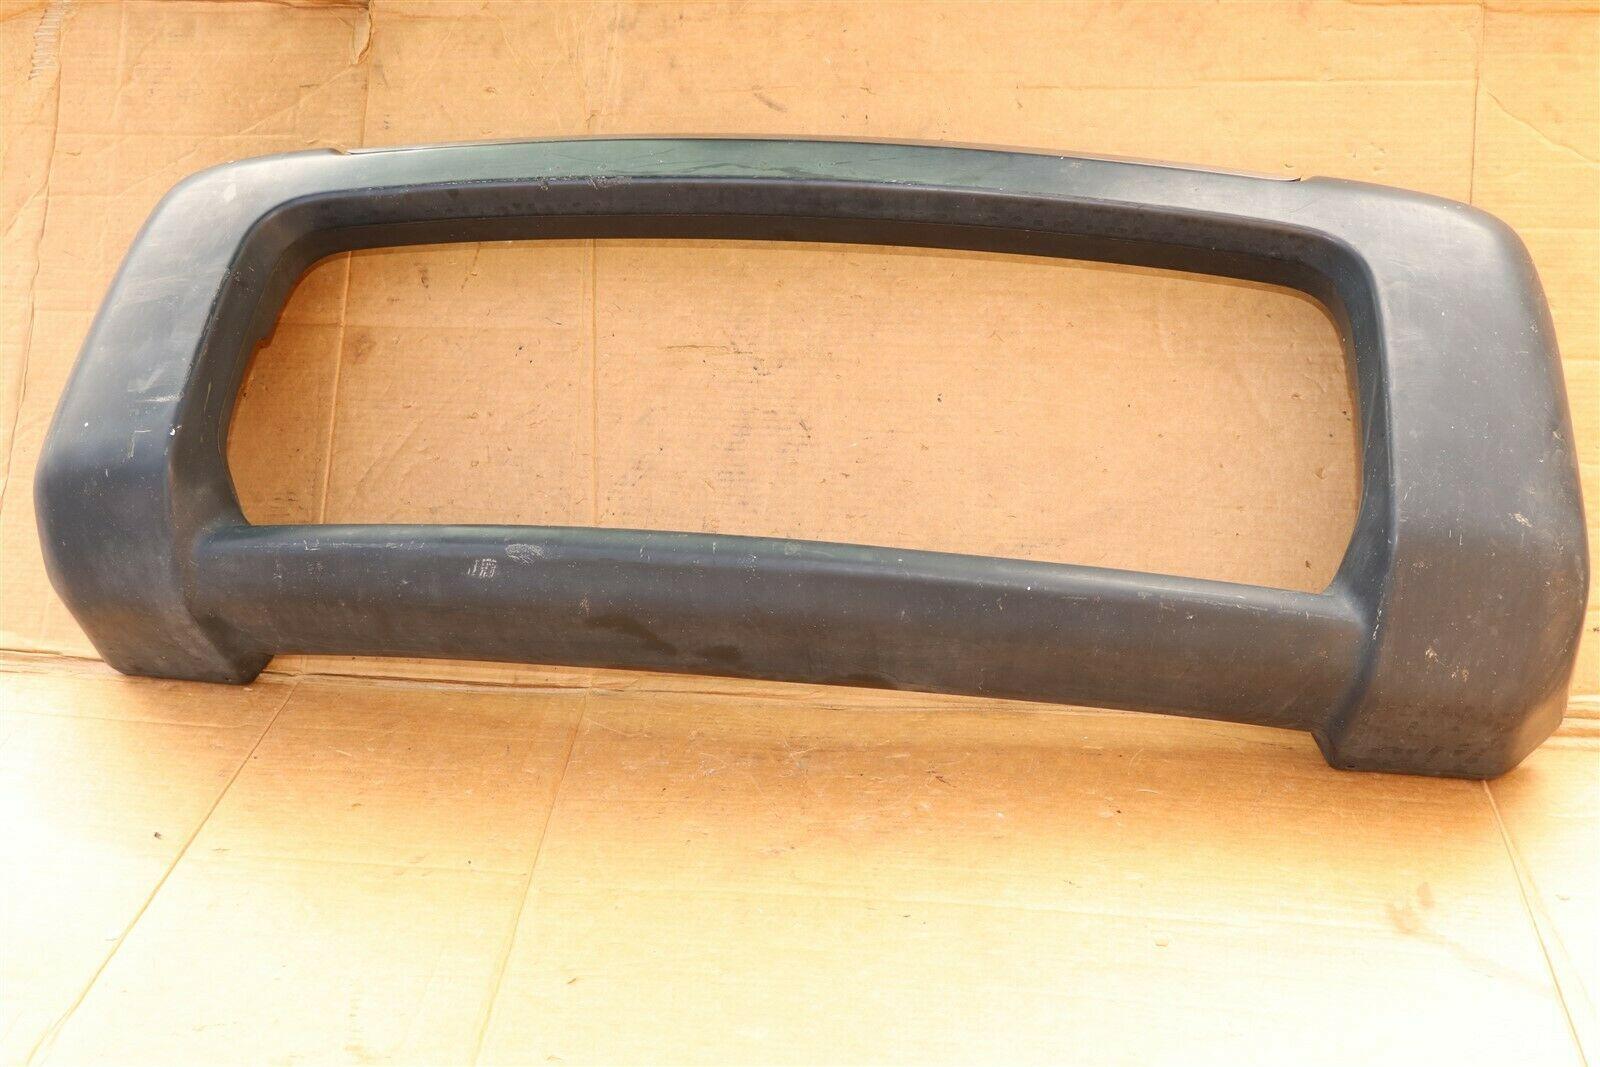 06-08 Honda Pilot Front Lower Bumper Plastic Brush Guard